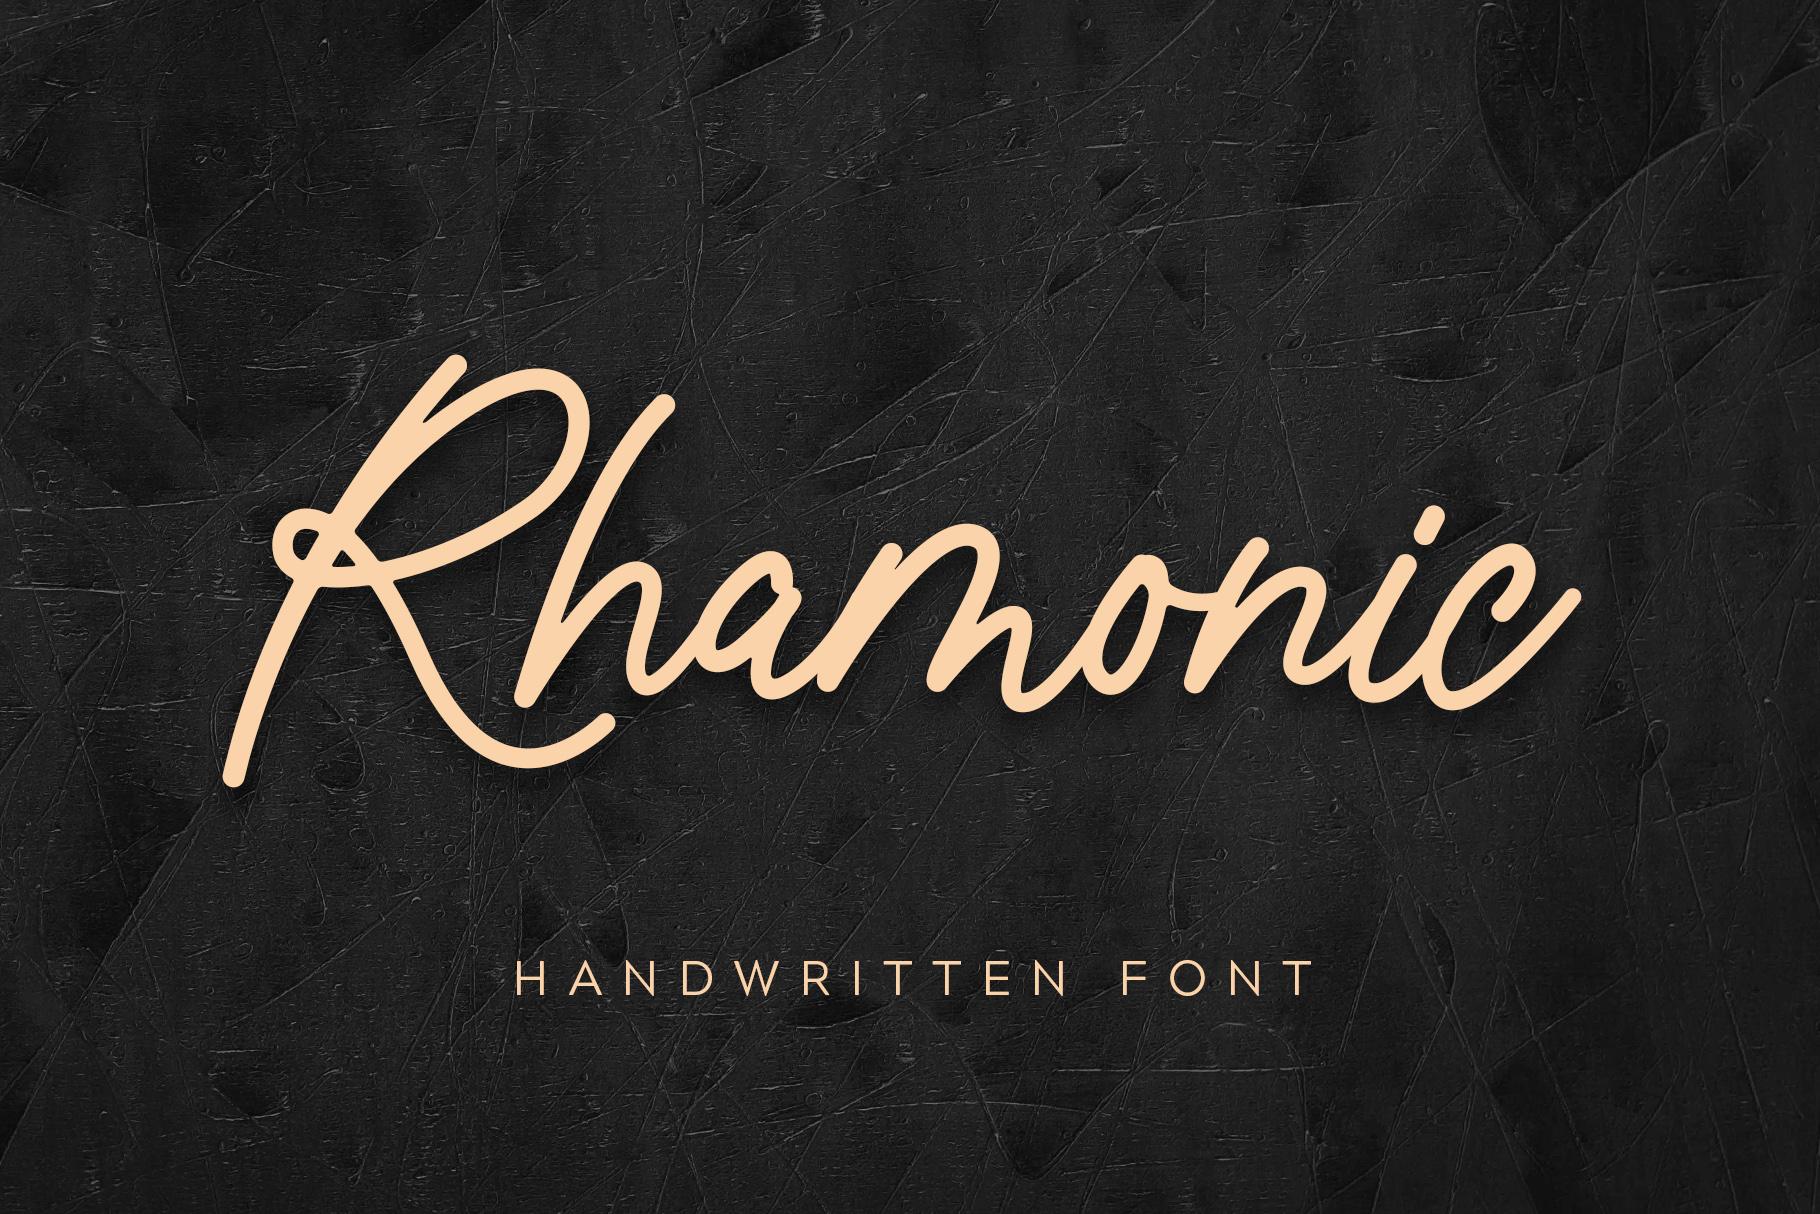 Rhamonic Handwritten Font example image 1